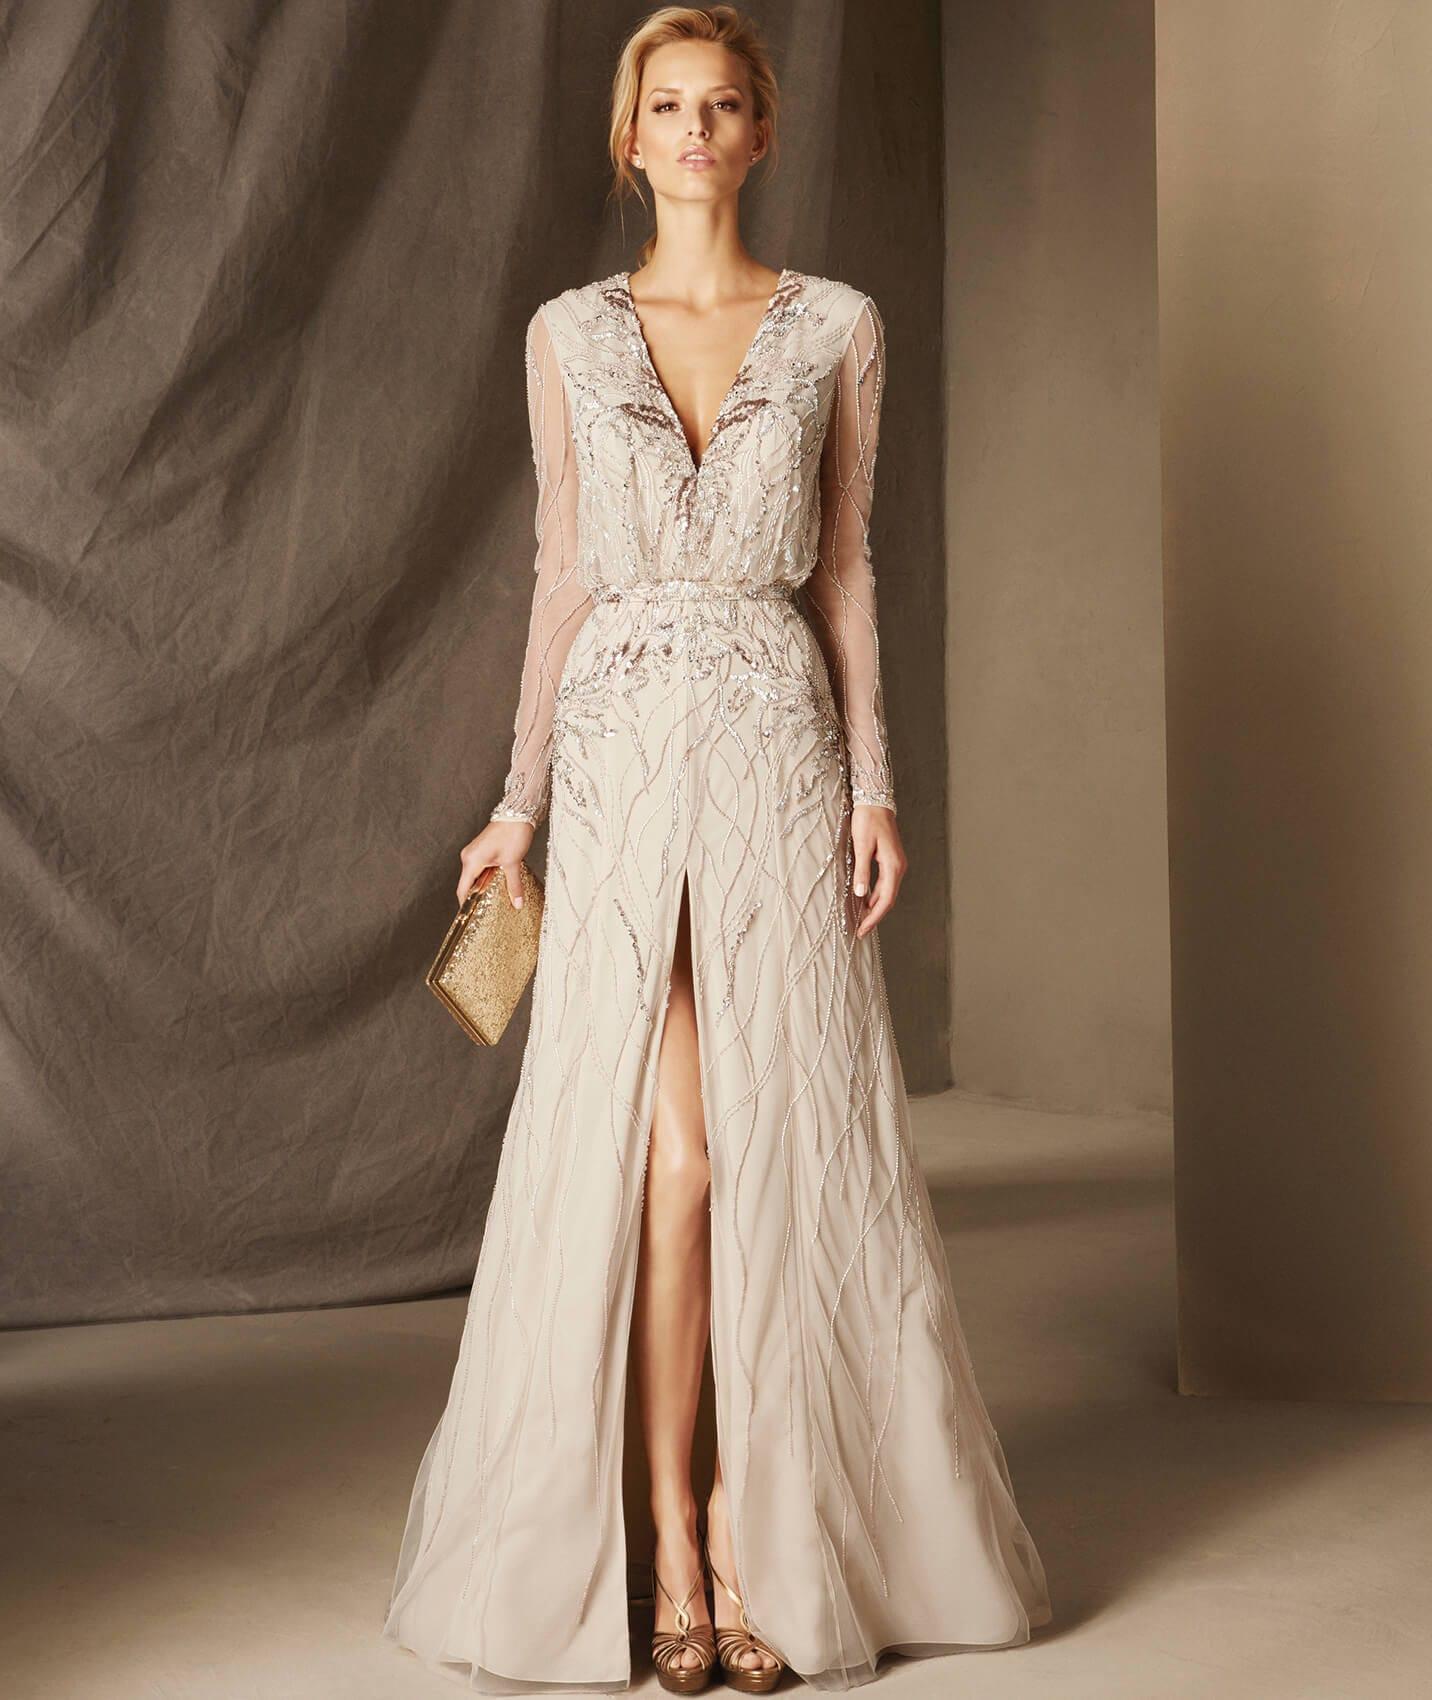 Bahamas dress